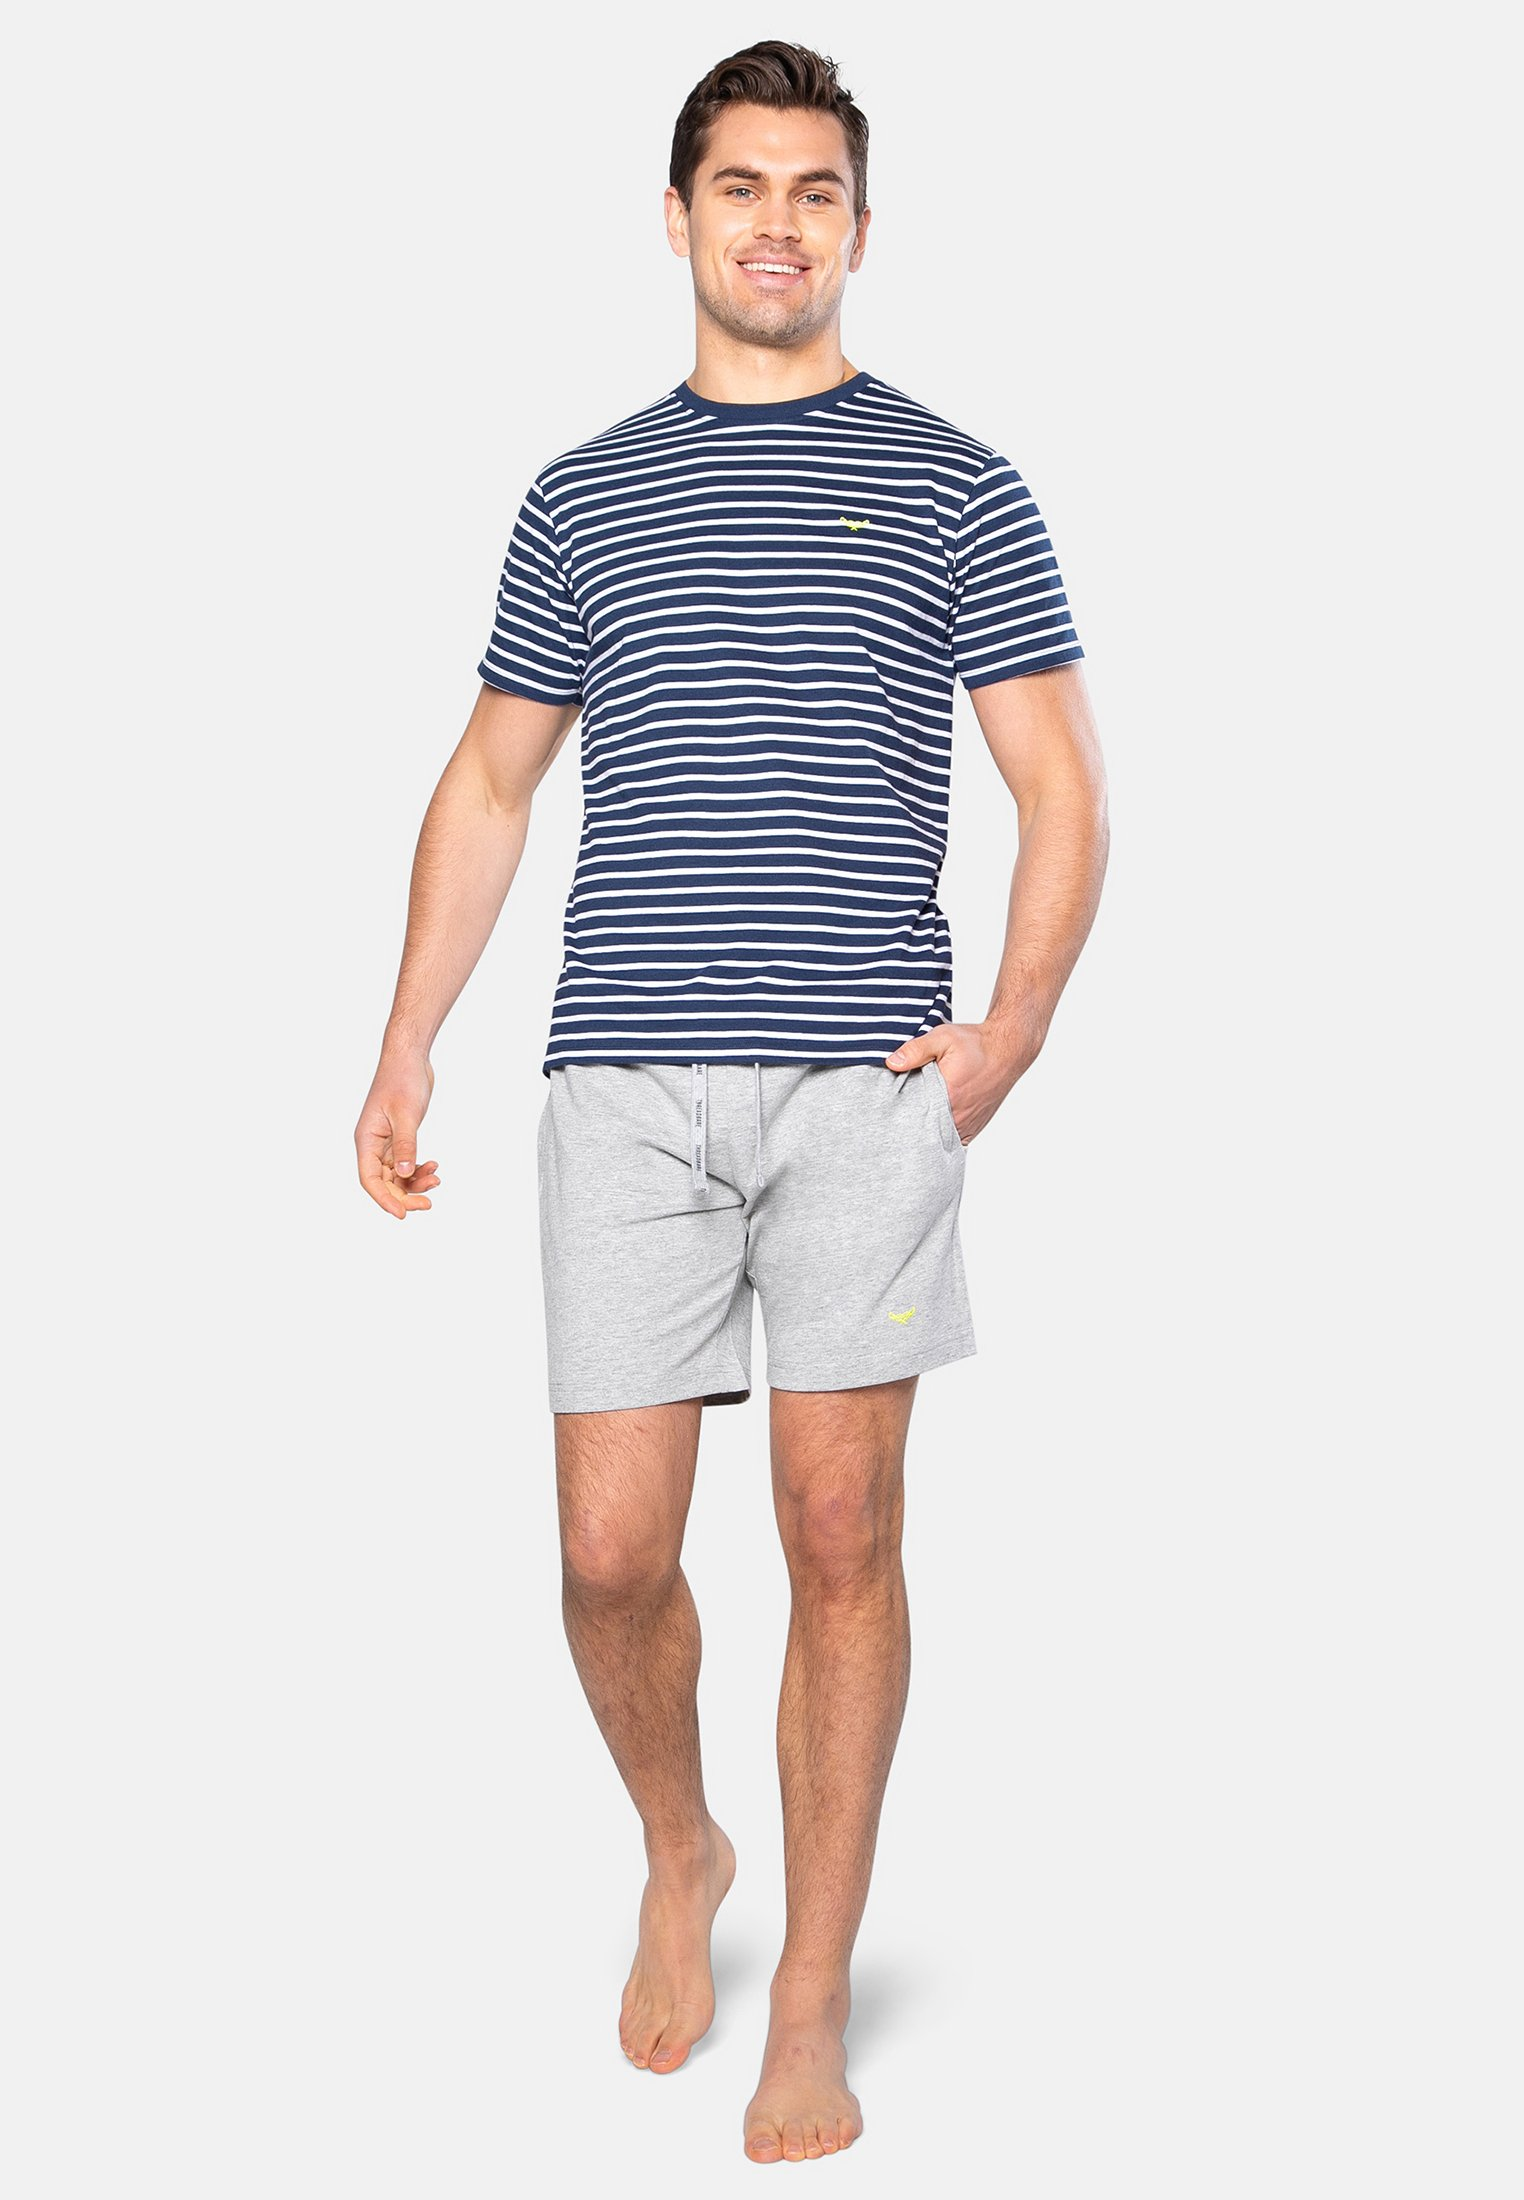 Homme KEAGAN 2 PIECE SET - Pyjama